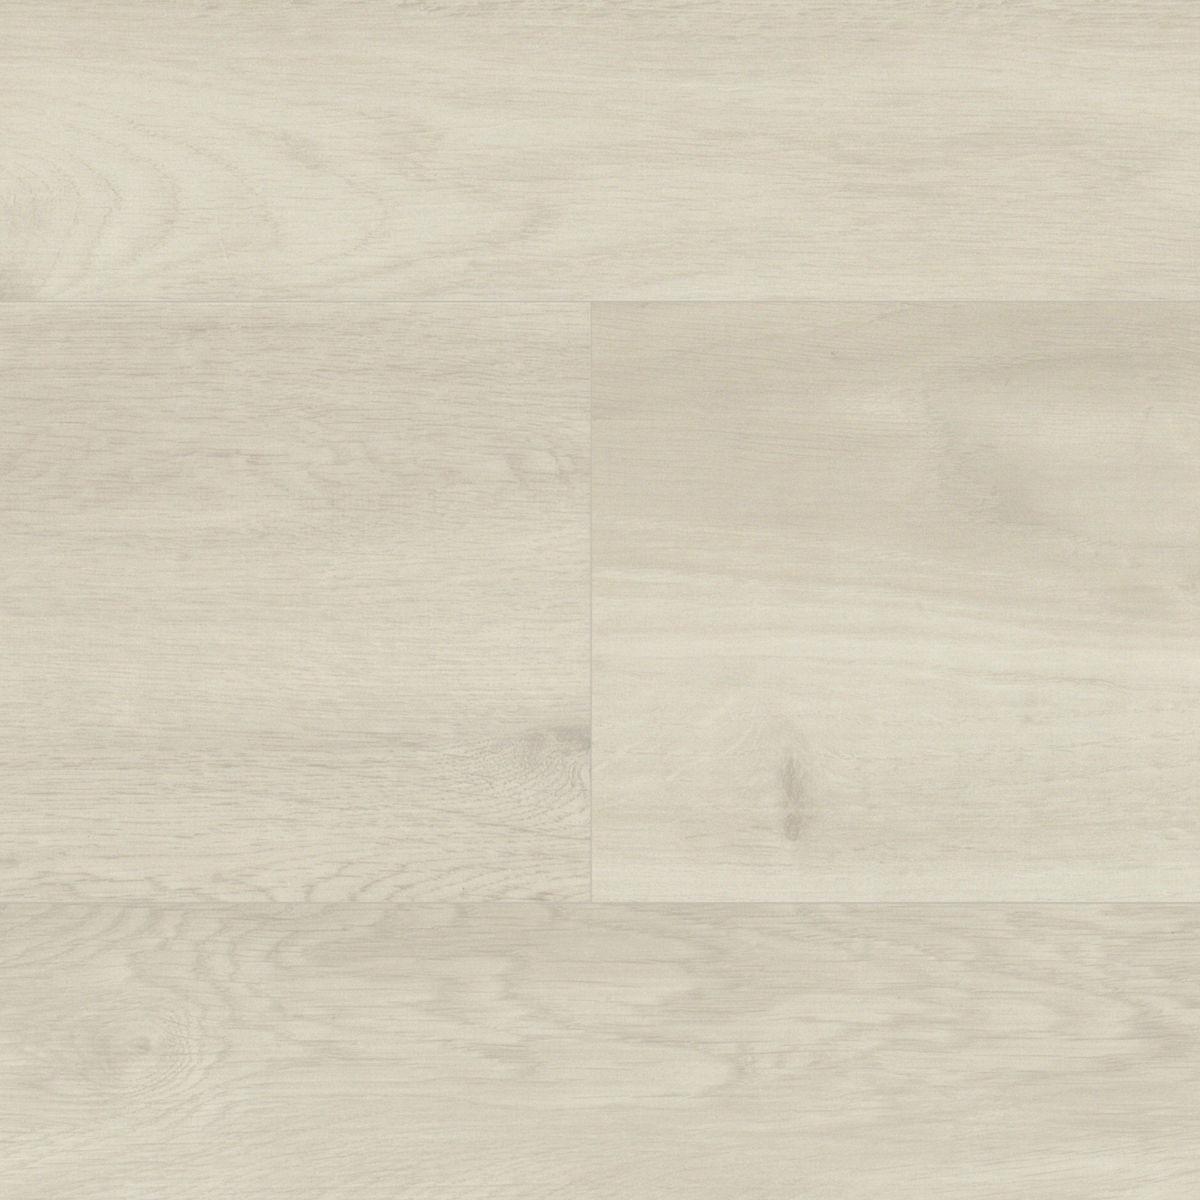 Karndean Van Gogh White Washed Oak Vgw80t Vinyl Flooring